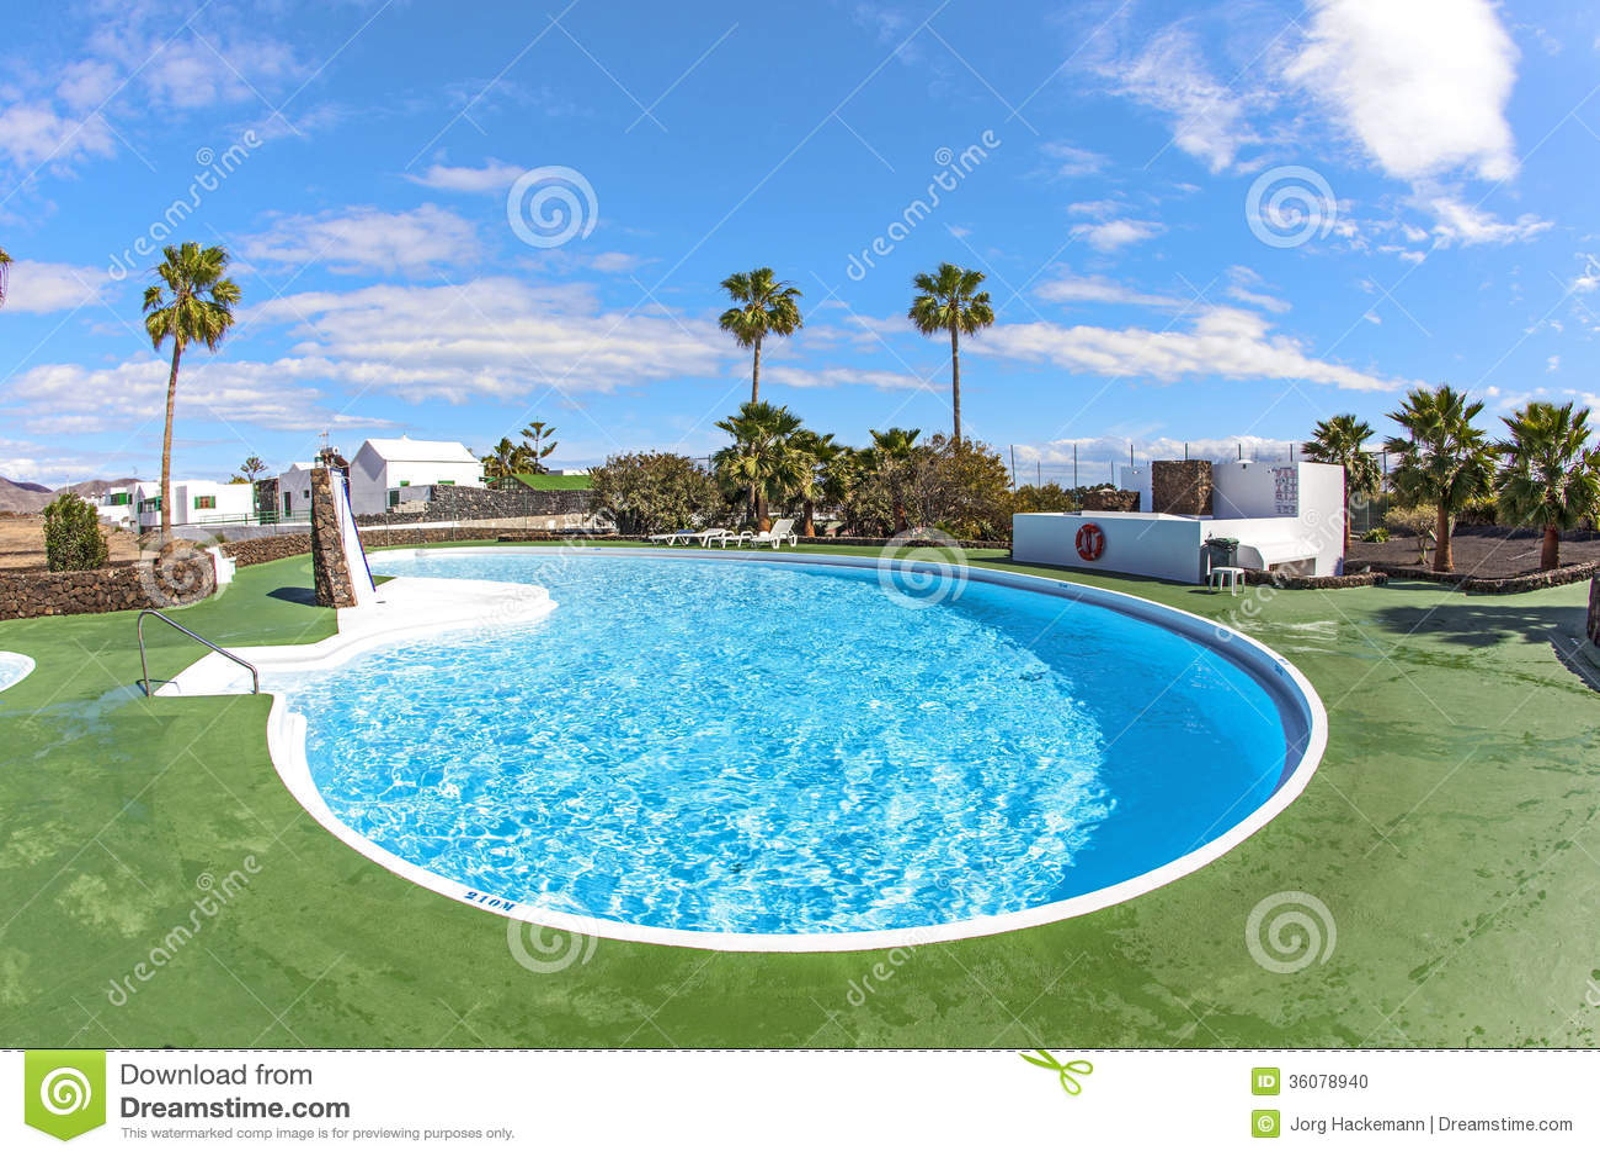 Outdoor pool in spain stock photo image 36078940 for Garden treasures pool clock